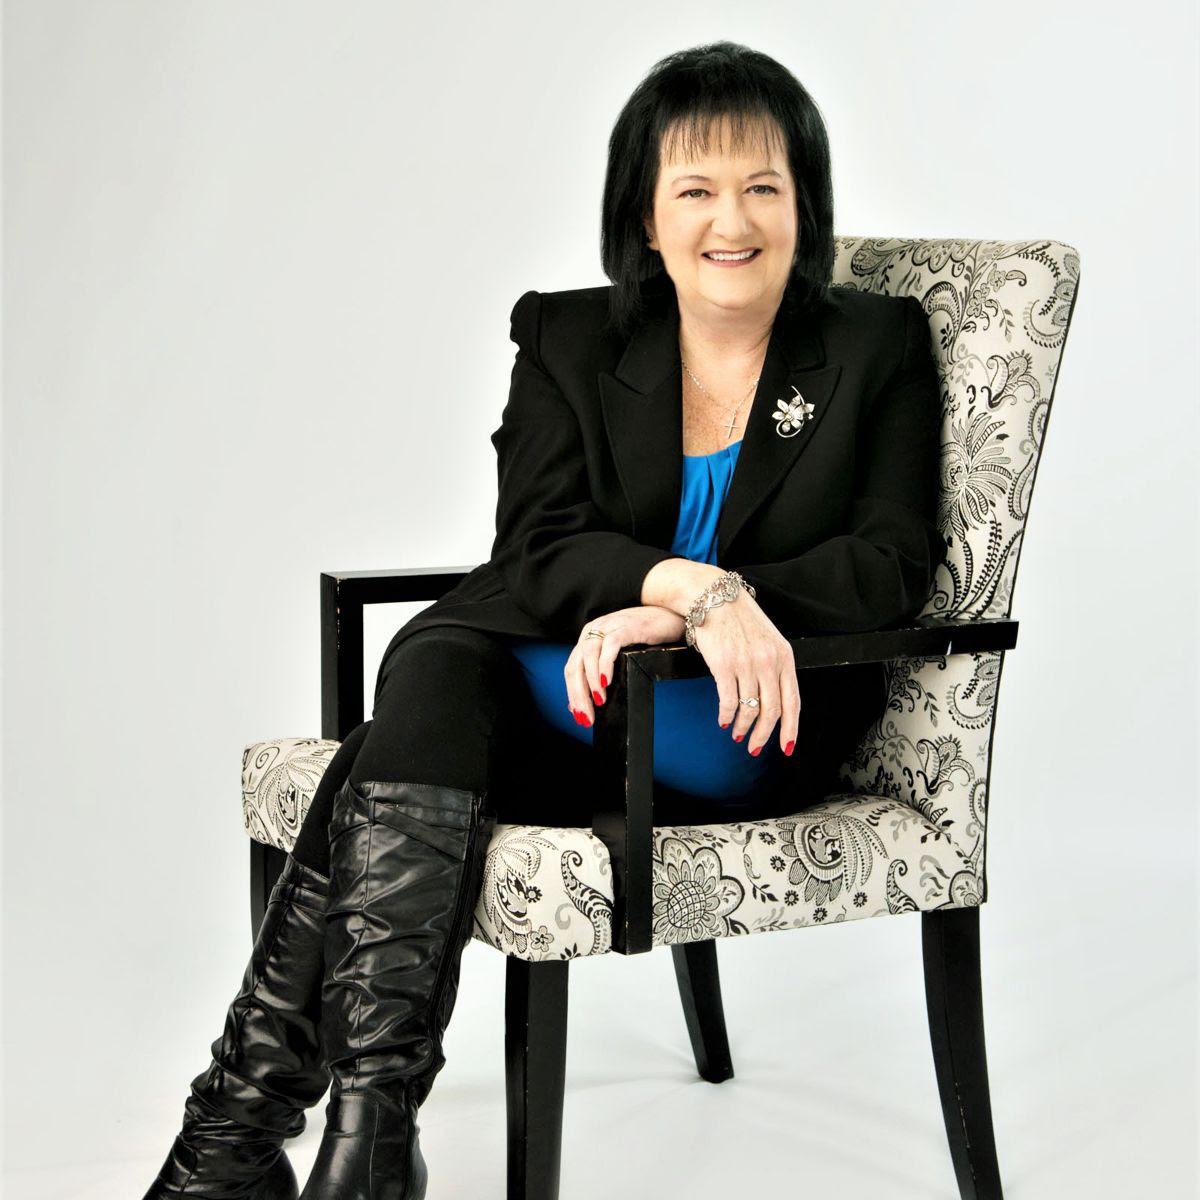 Eileen Bobowski